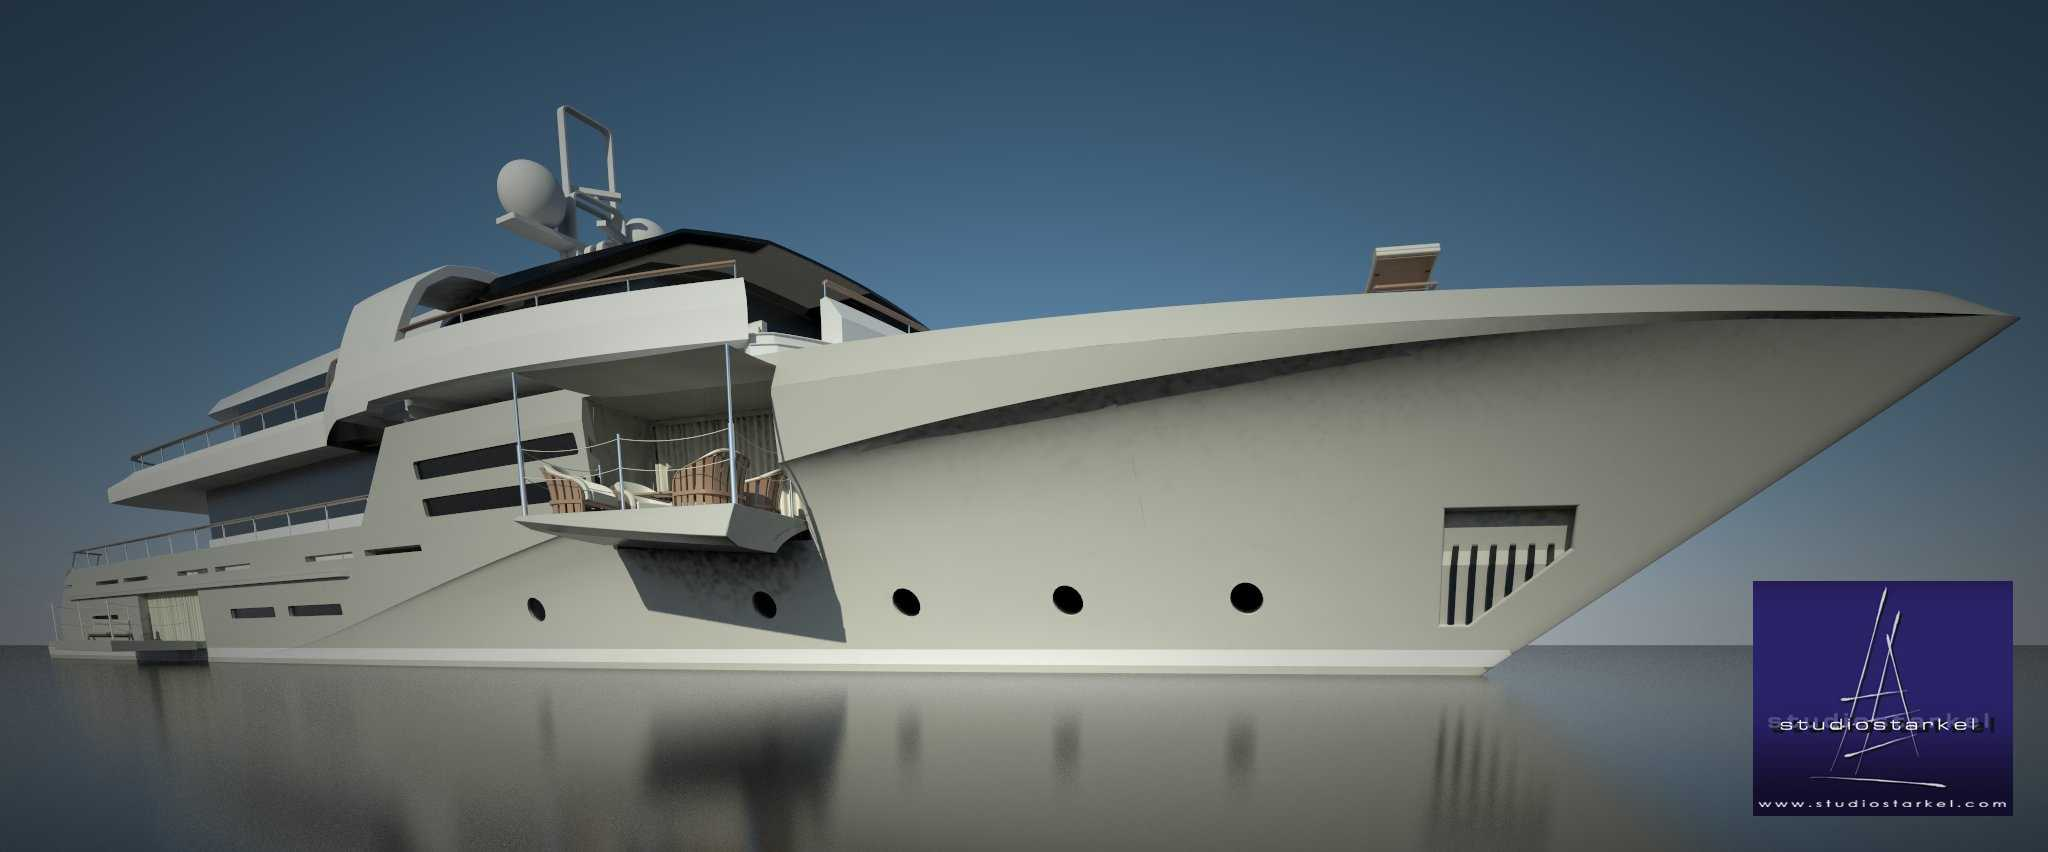 44m diesel electric luxury yacht design  u2014 yacht charter  u0026 superyacht news